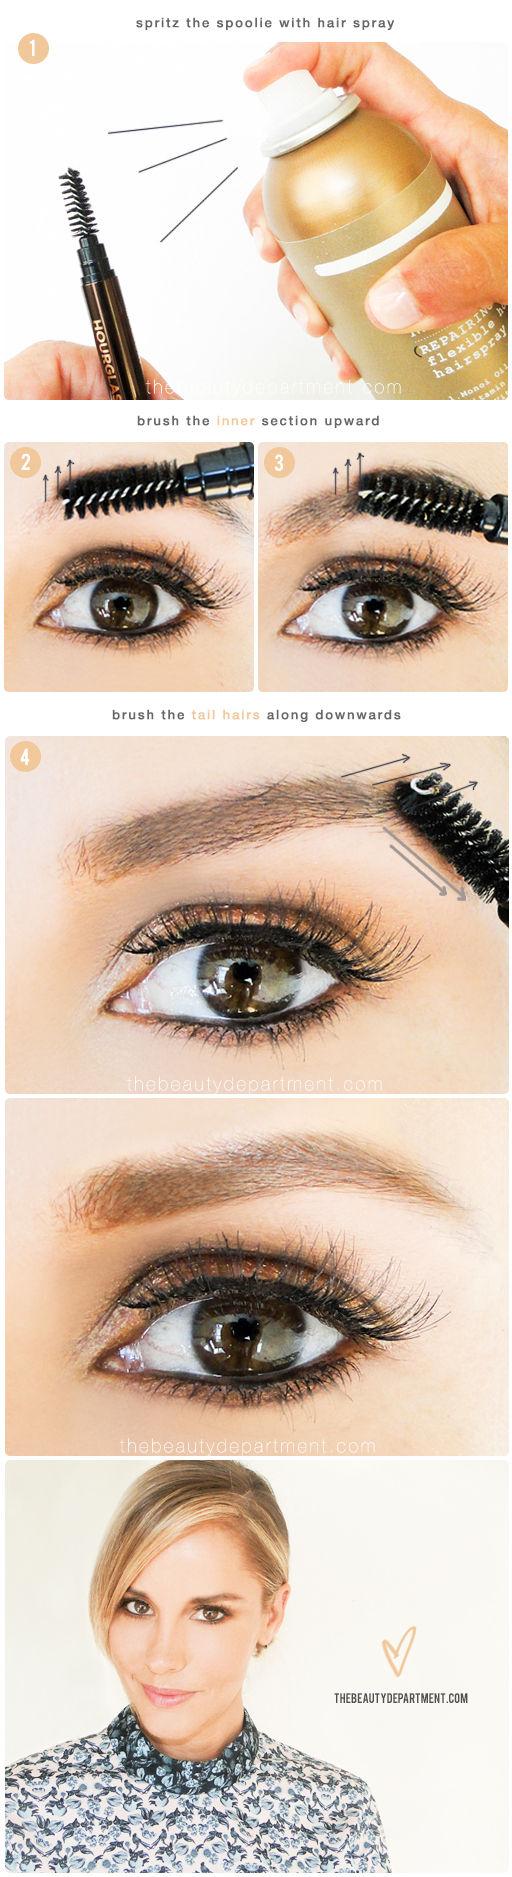 Maidenhead Eyebrow Threading Page 2 Jasmine Beauty